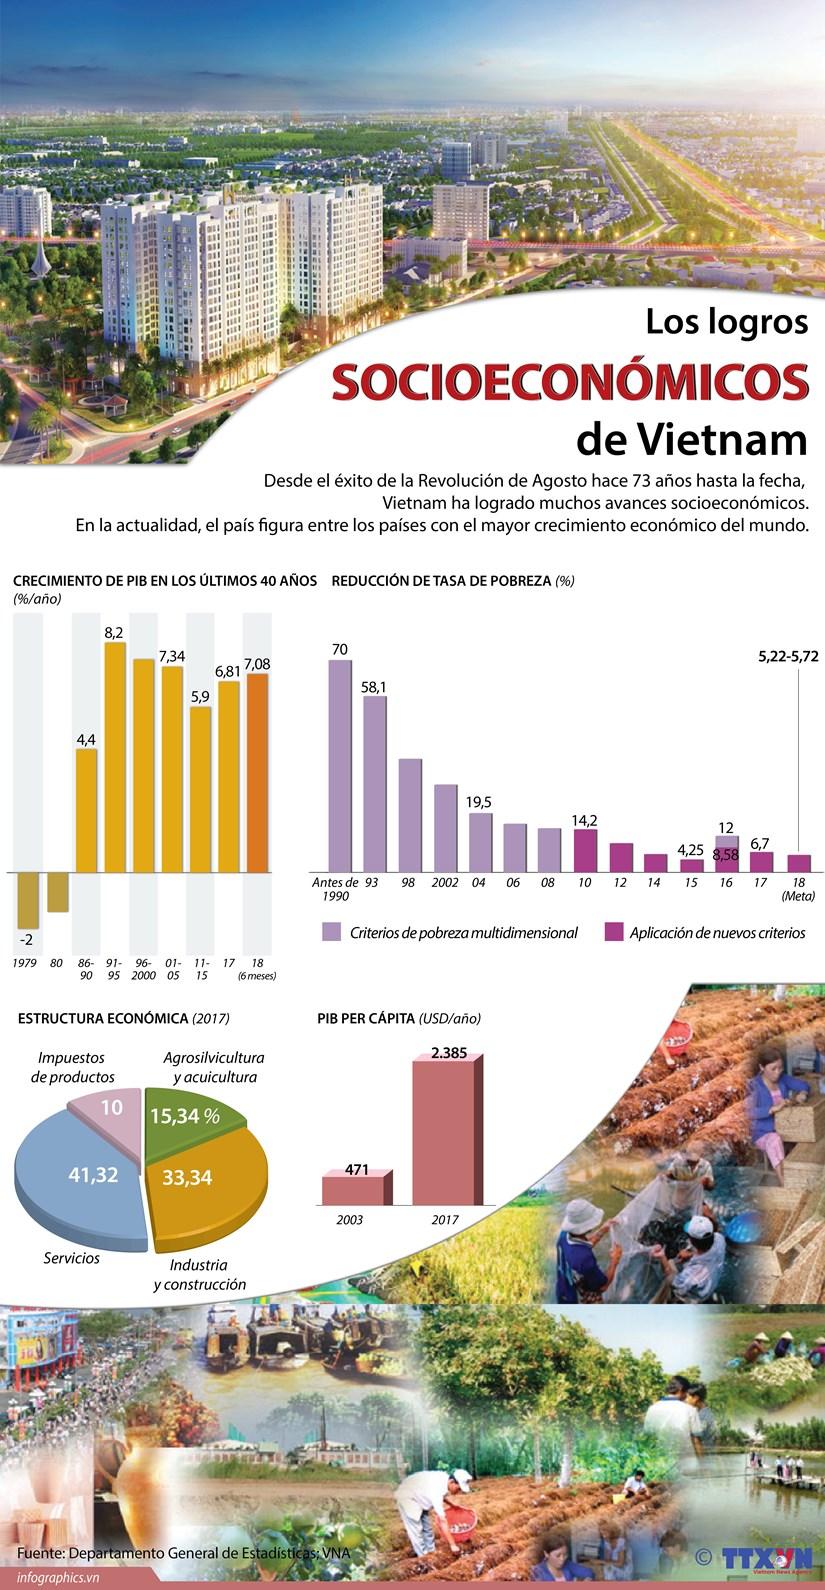 [Infografia] Logros socioeconomicos de Vietnam hinh anh 1